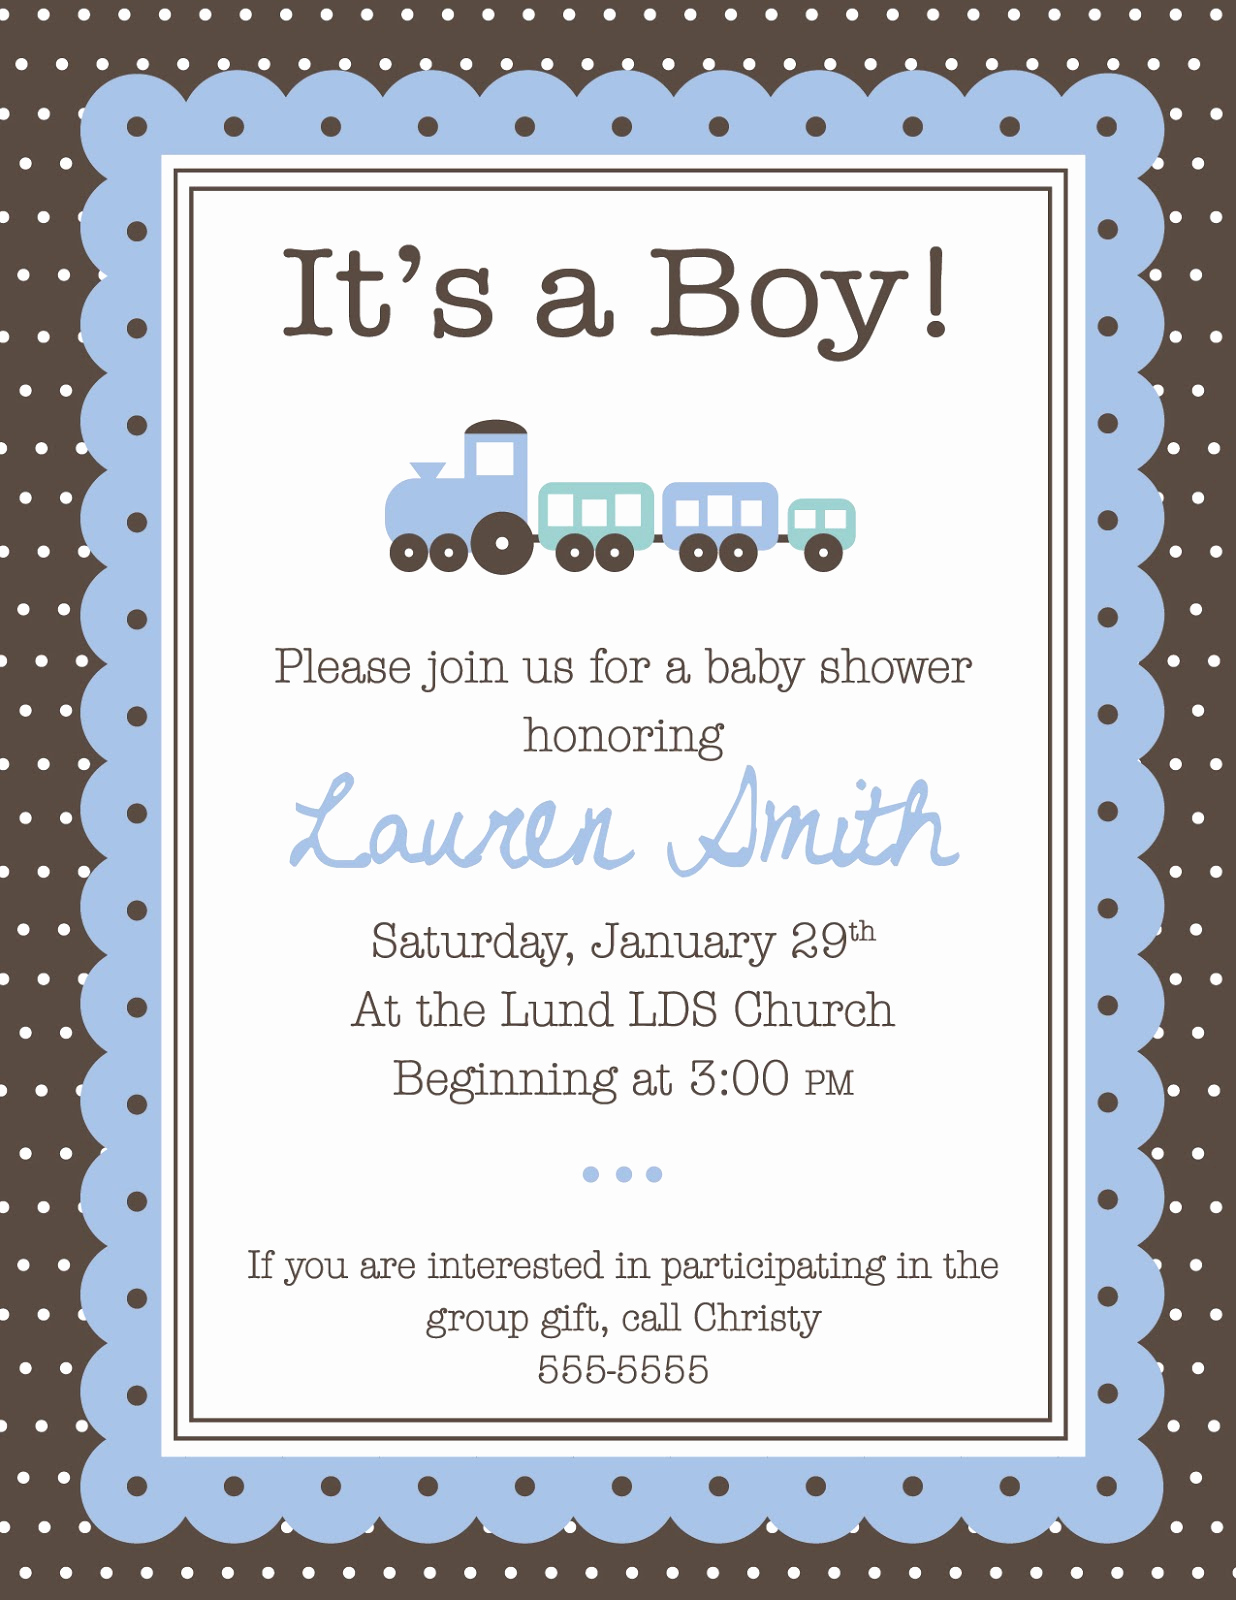 Baby Boy Shower Invitation Ideas Luxury Ideas for Baby Shower Invitations for A Boy